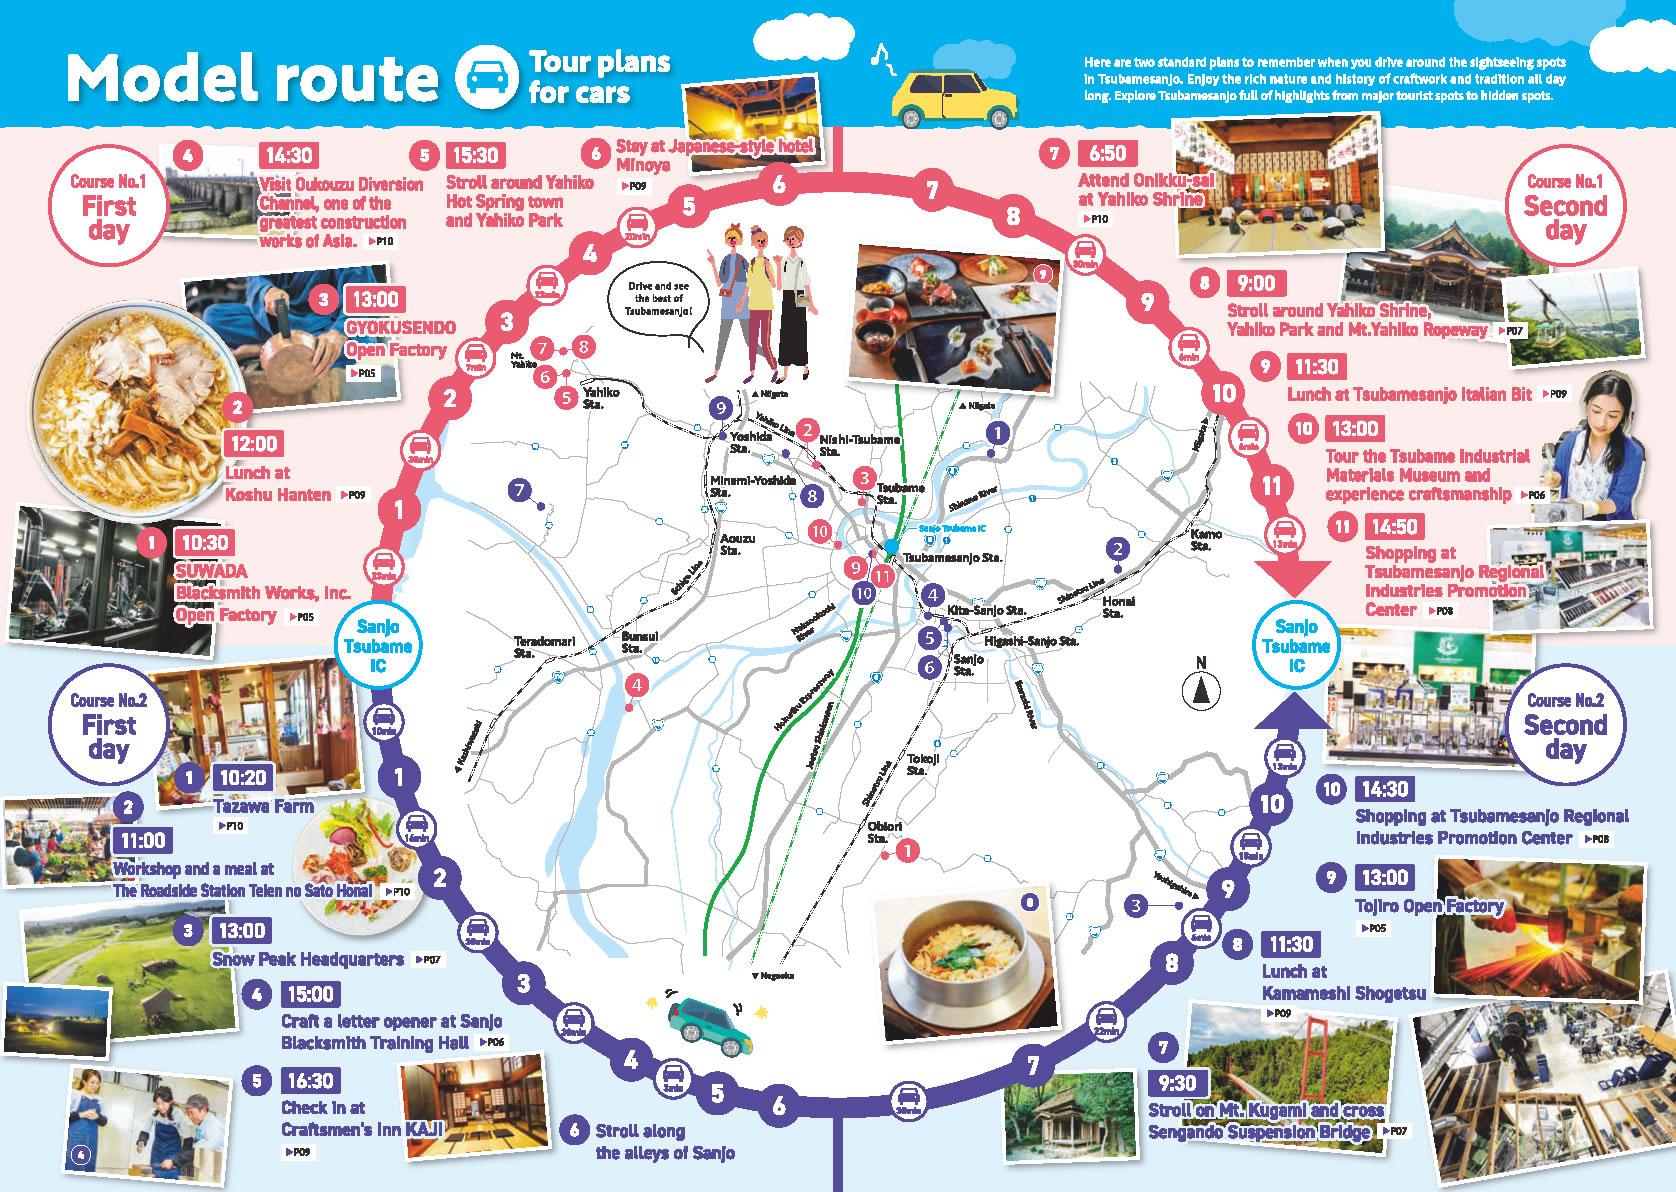 Model route